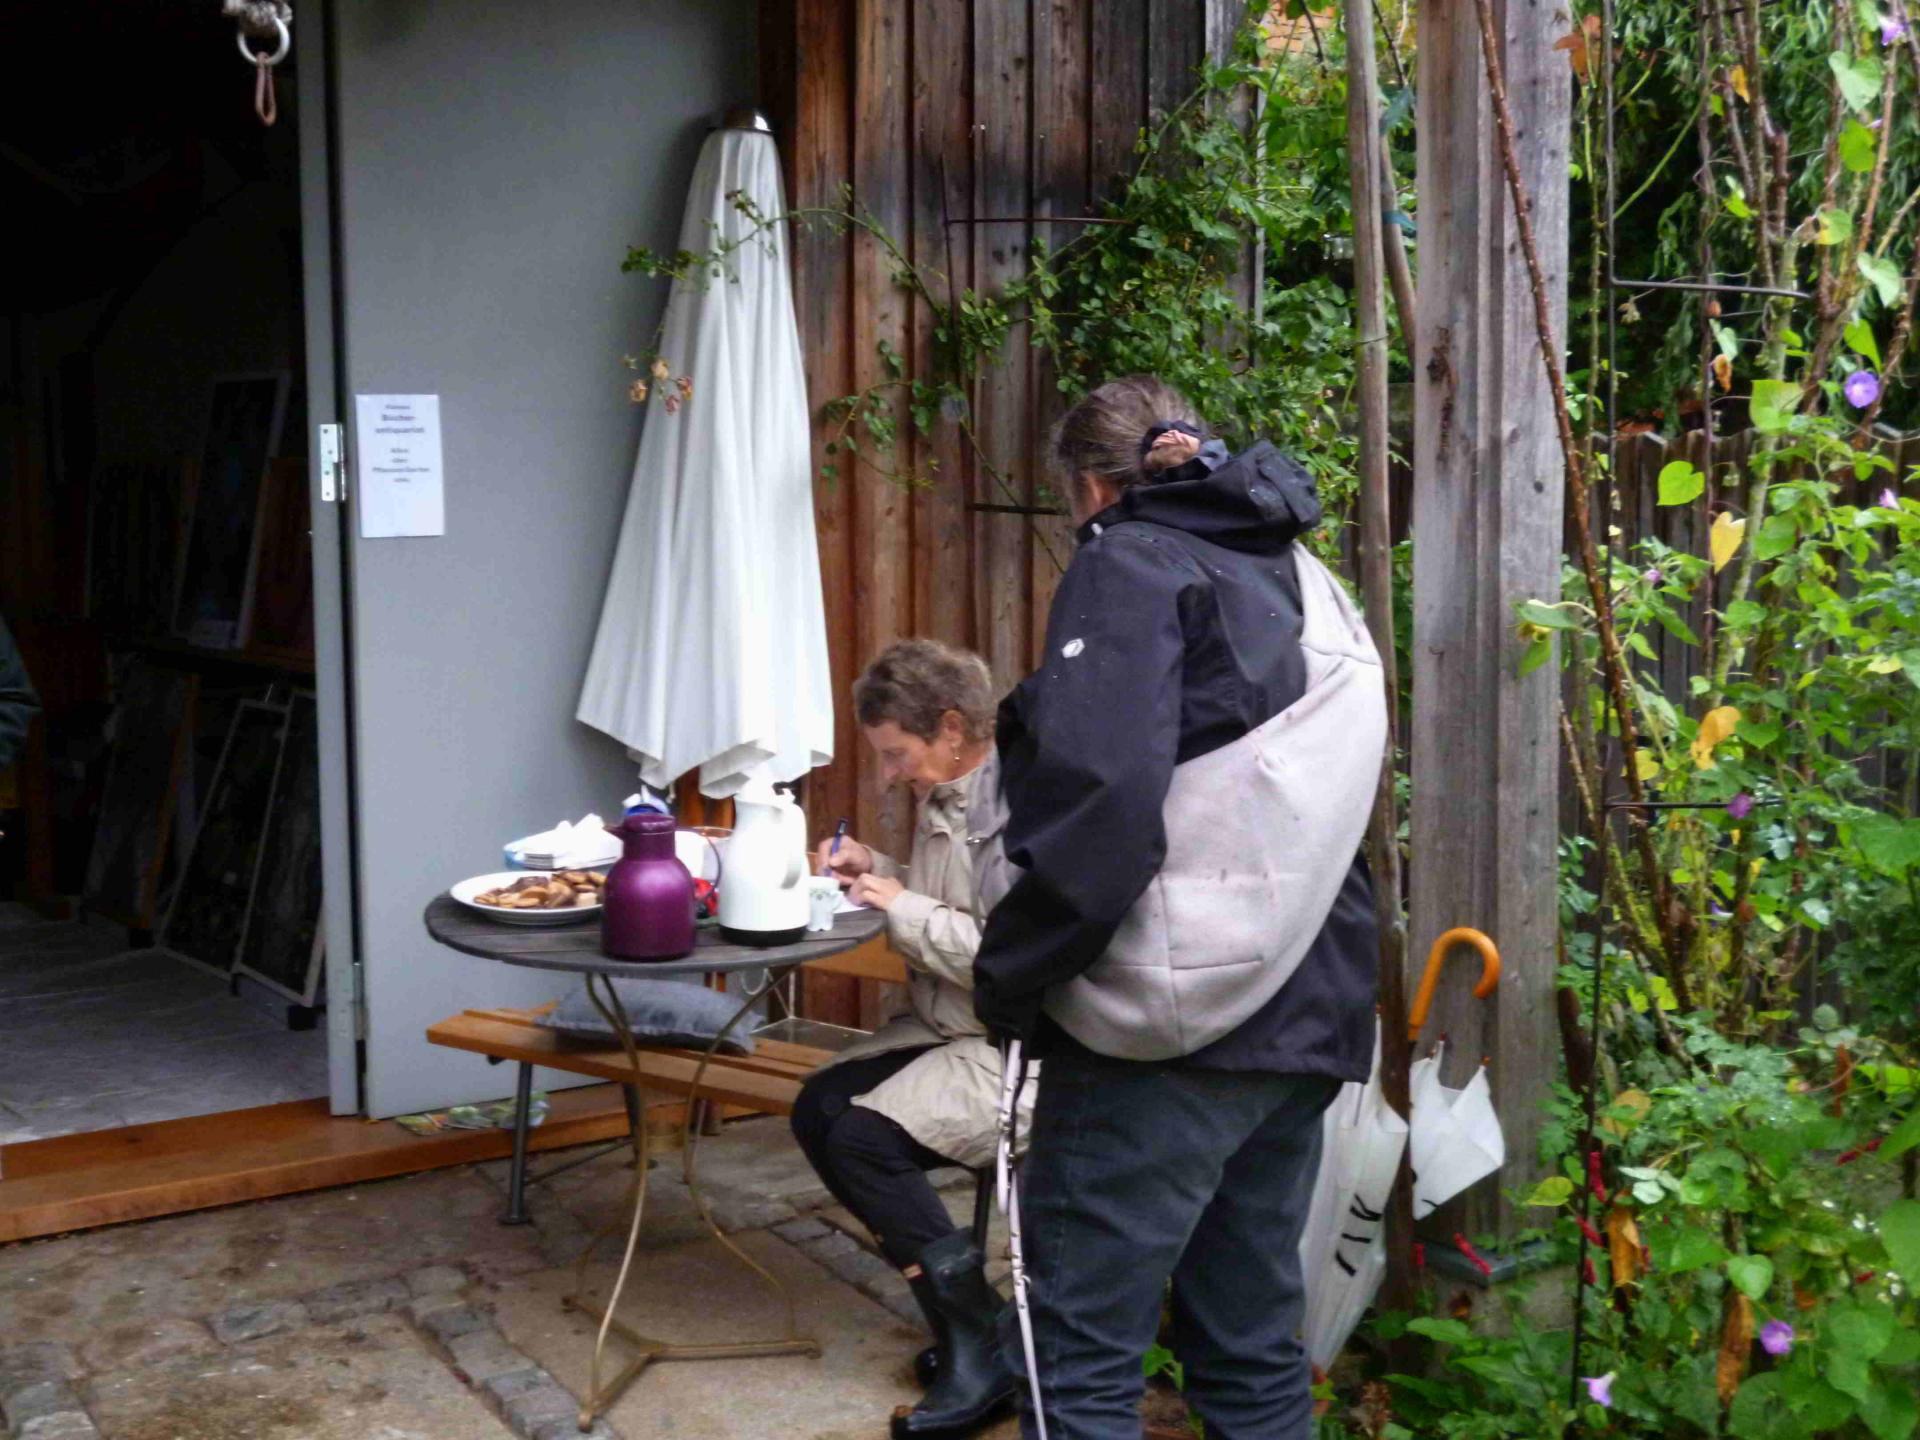 Offene Gartenpfporte 26-09-2020 Bild 01